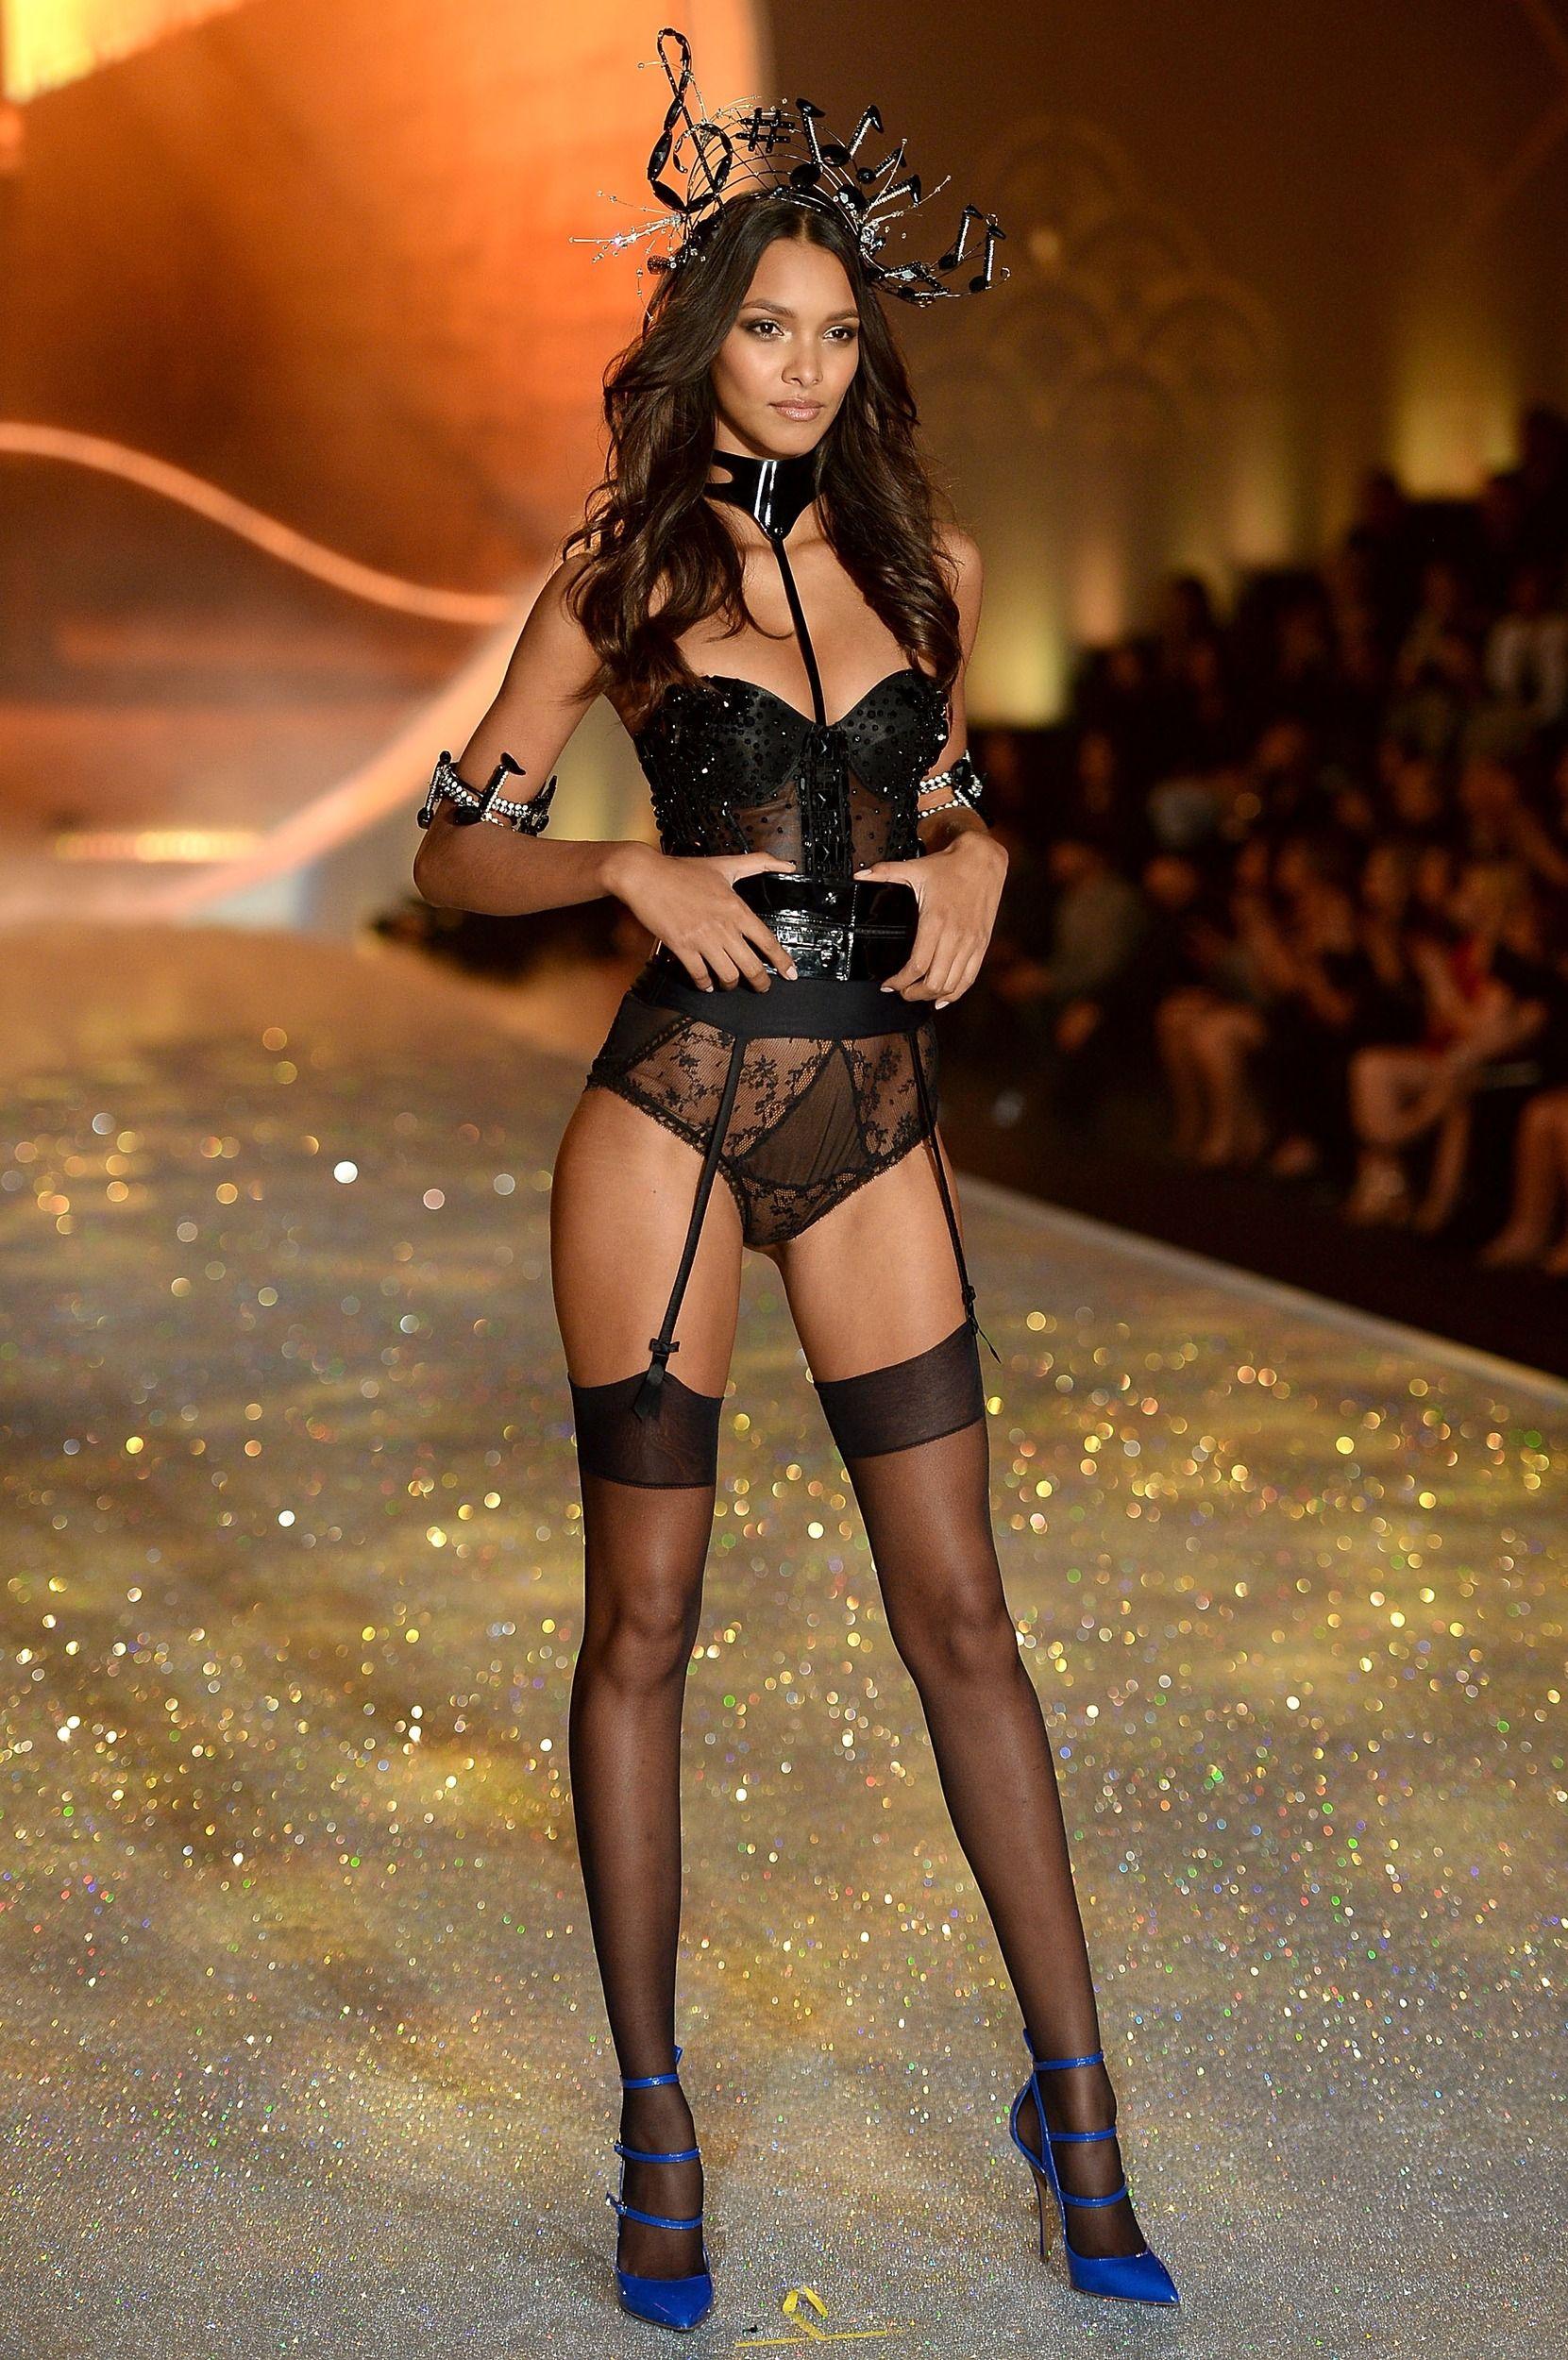 2d84b3f6e5 Lais ribeiro walks the runway at the victorias secret fashion show on  november in new york